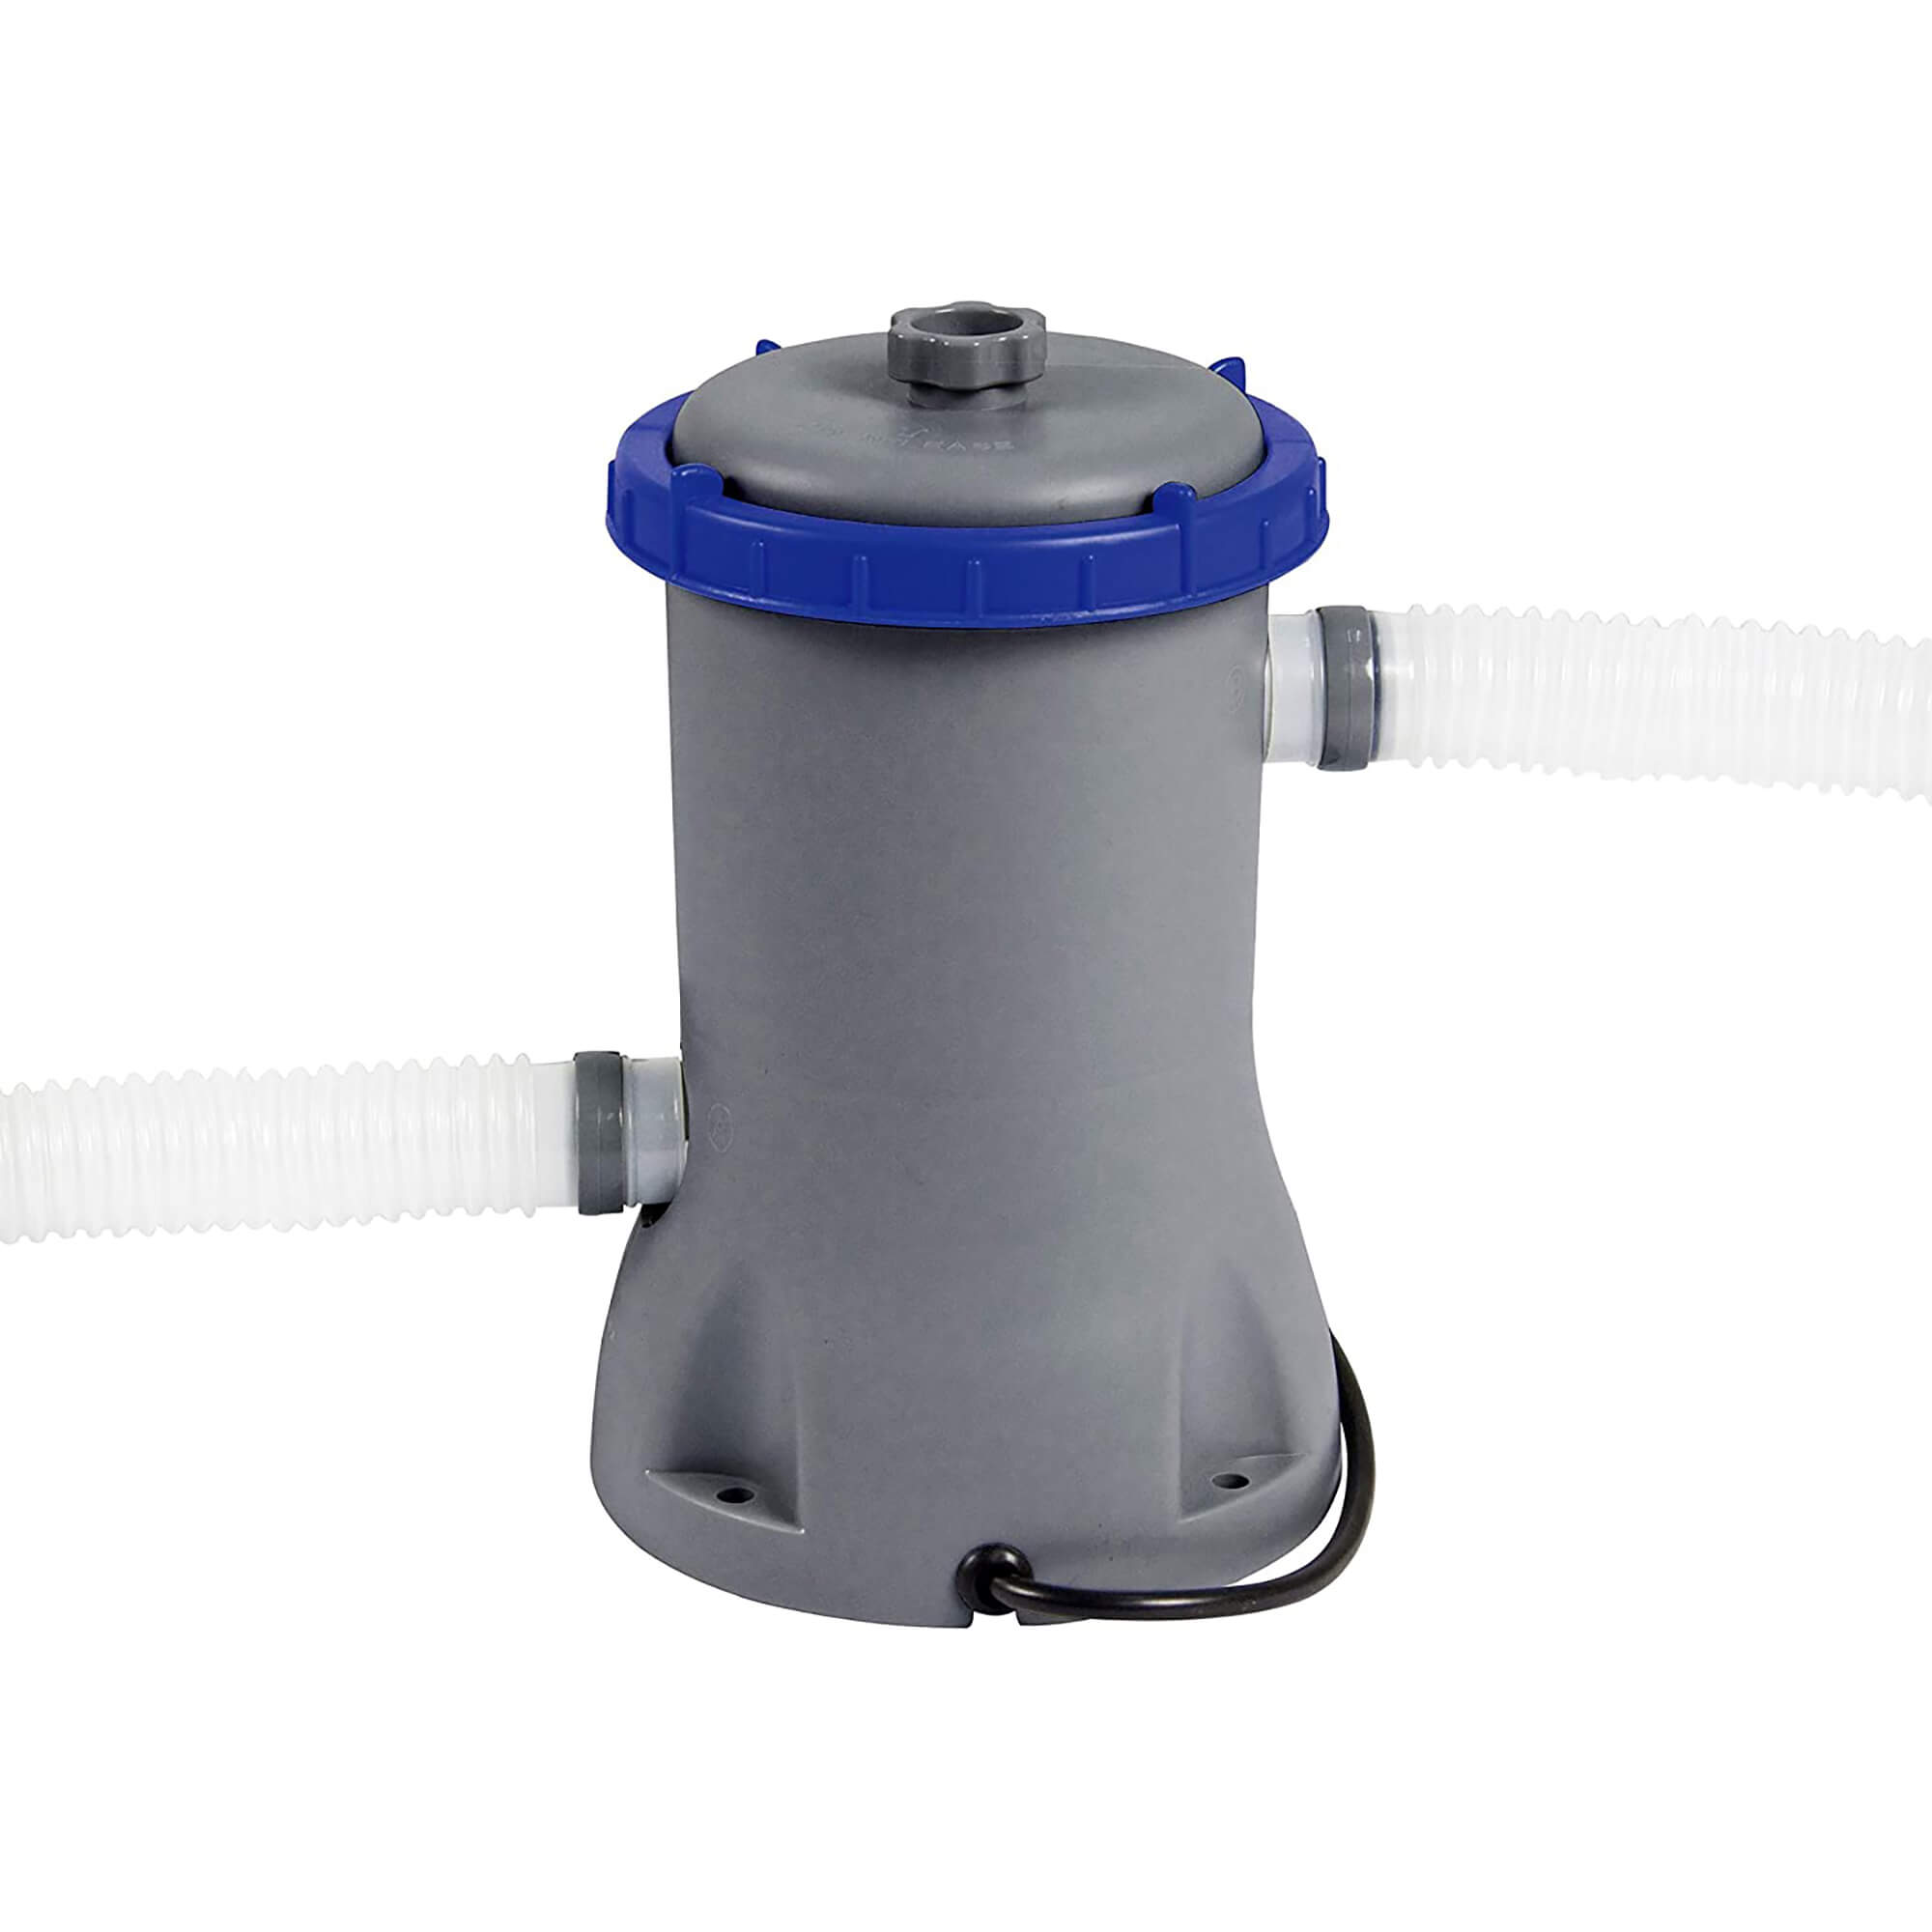 Flowclear Filterpumpe 2006 l/h